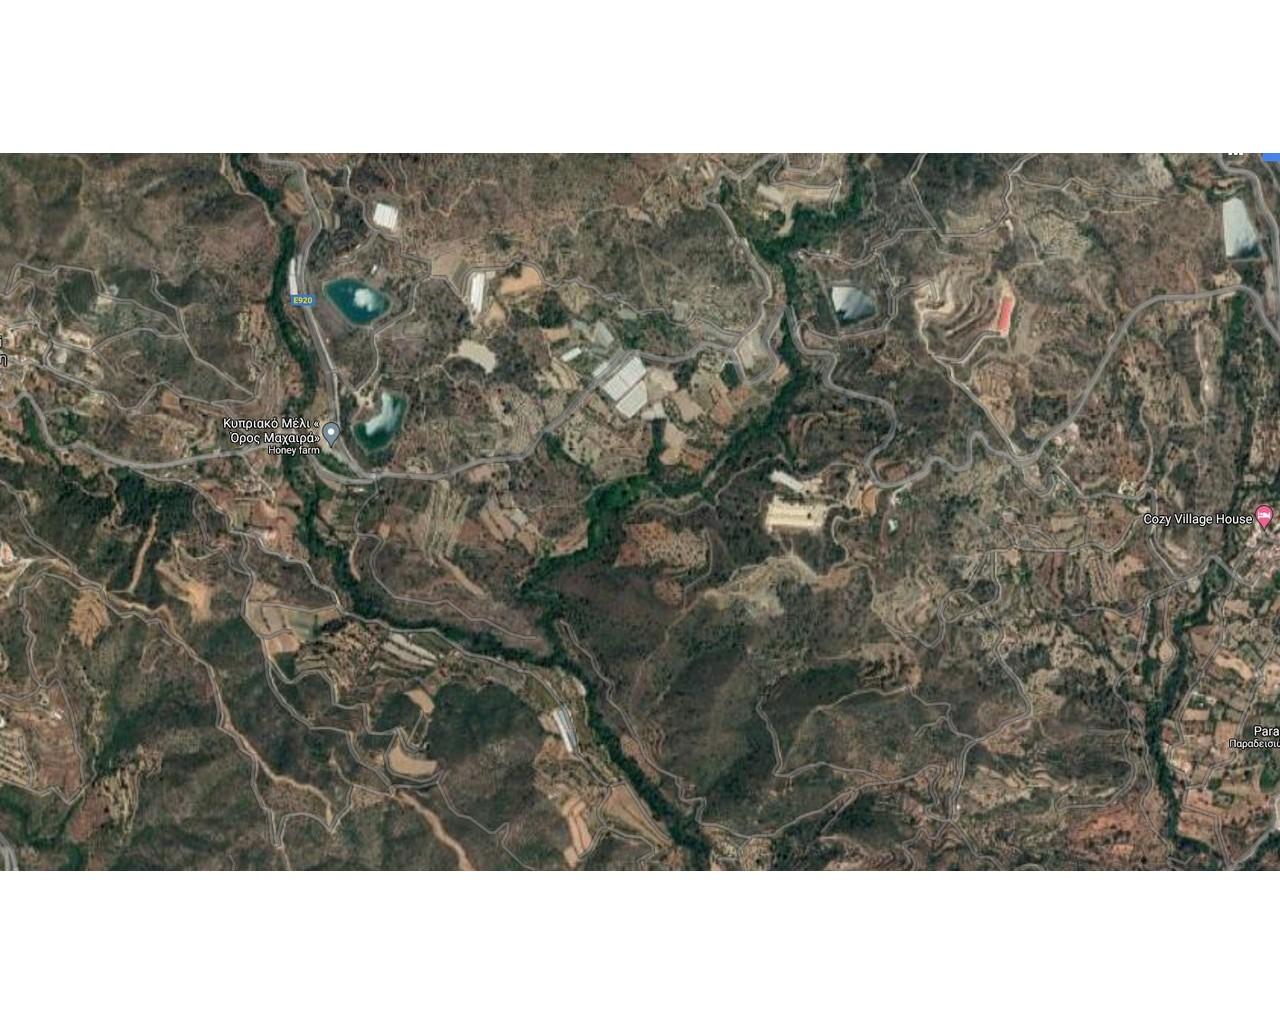 Land Larnaca(Ora)  669 SqMt for sale